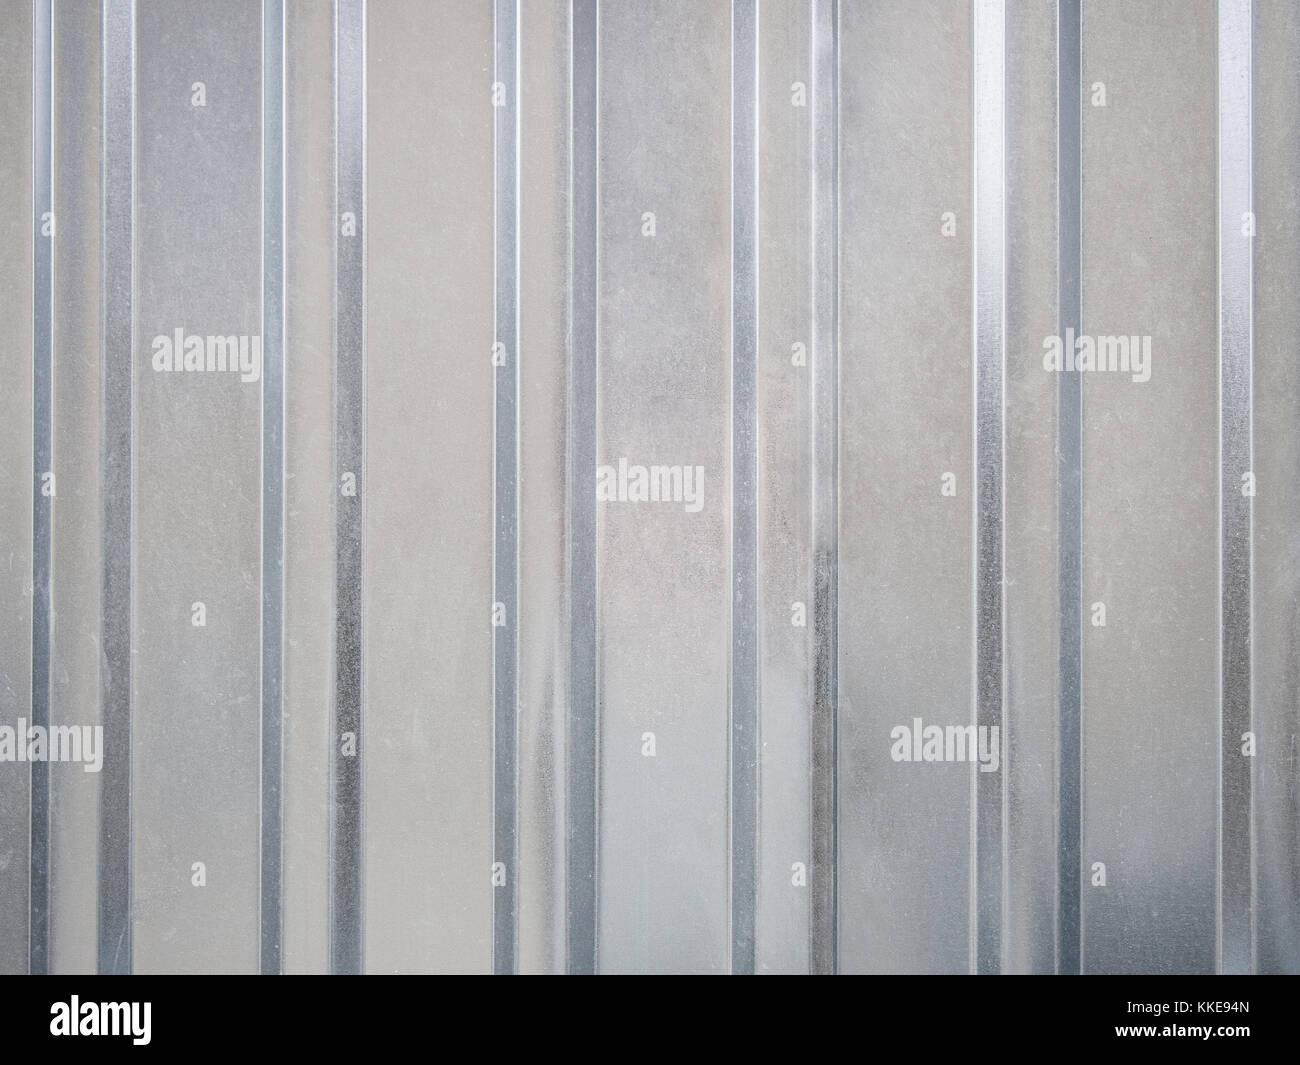 Galvanized corrugated board background - Stock Image